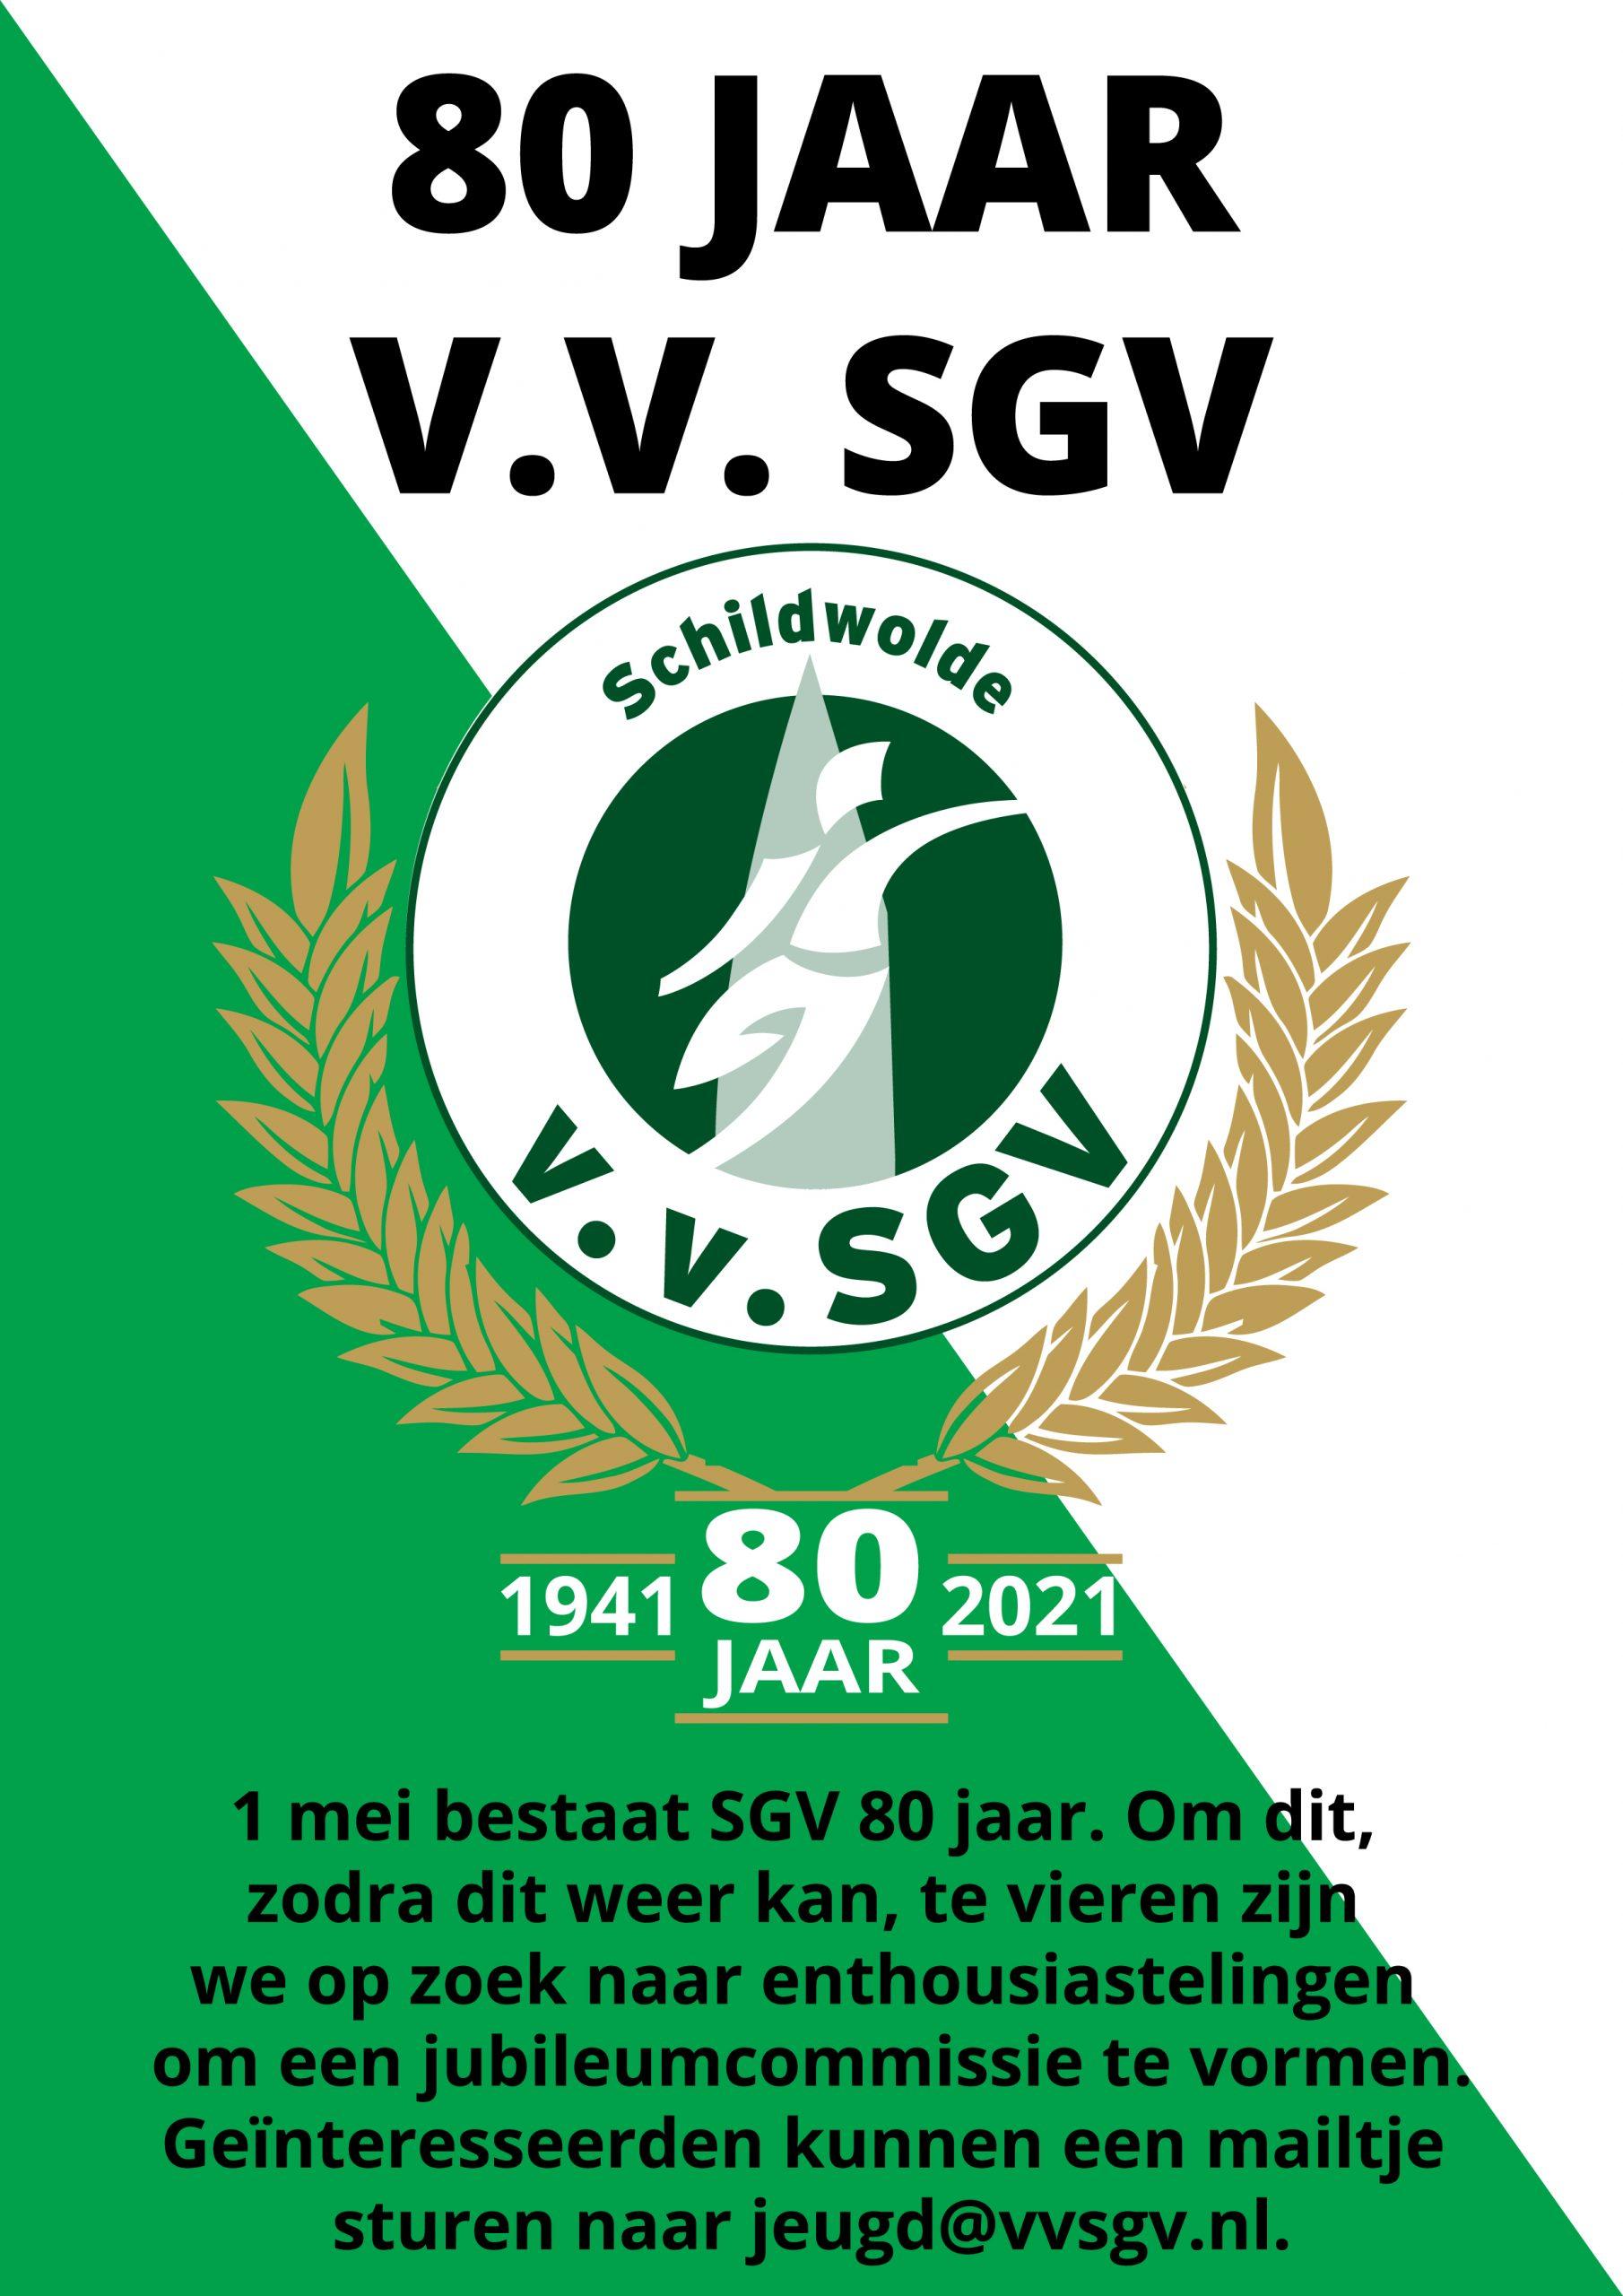 80 jaar V.V. SGV